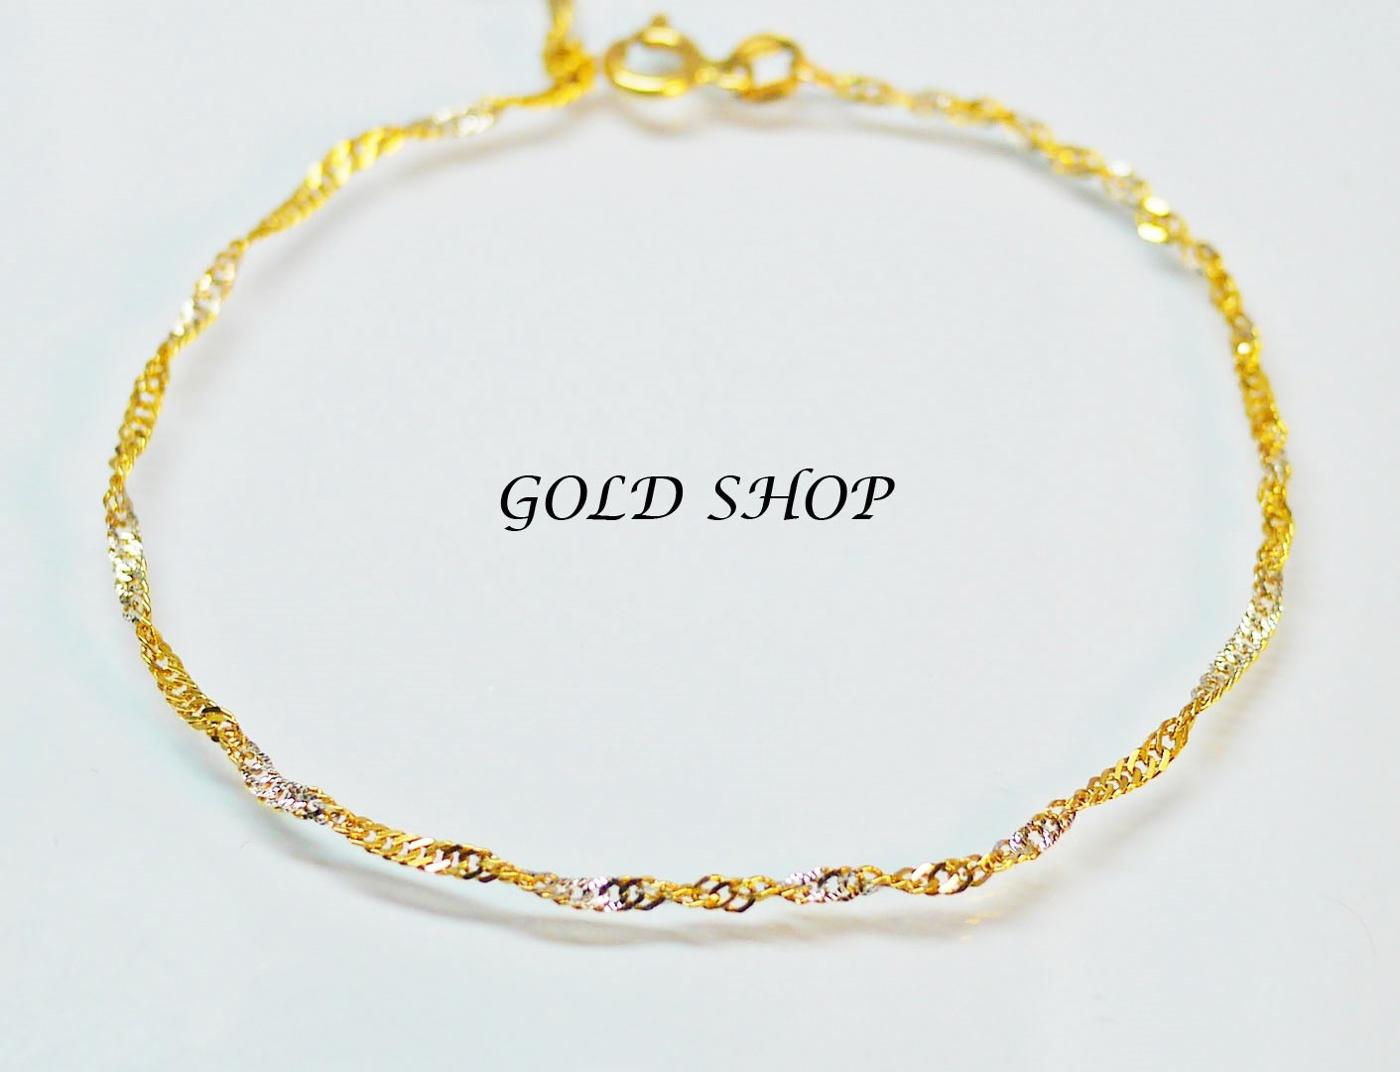 gold shop義大利585三彩K金手鍊kb 030-0.35